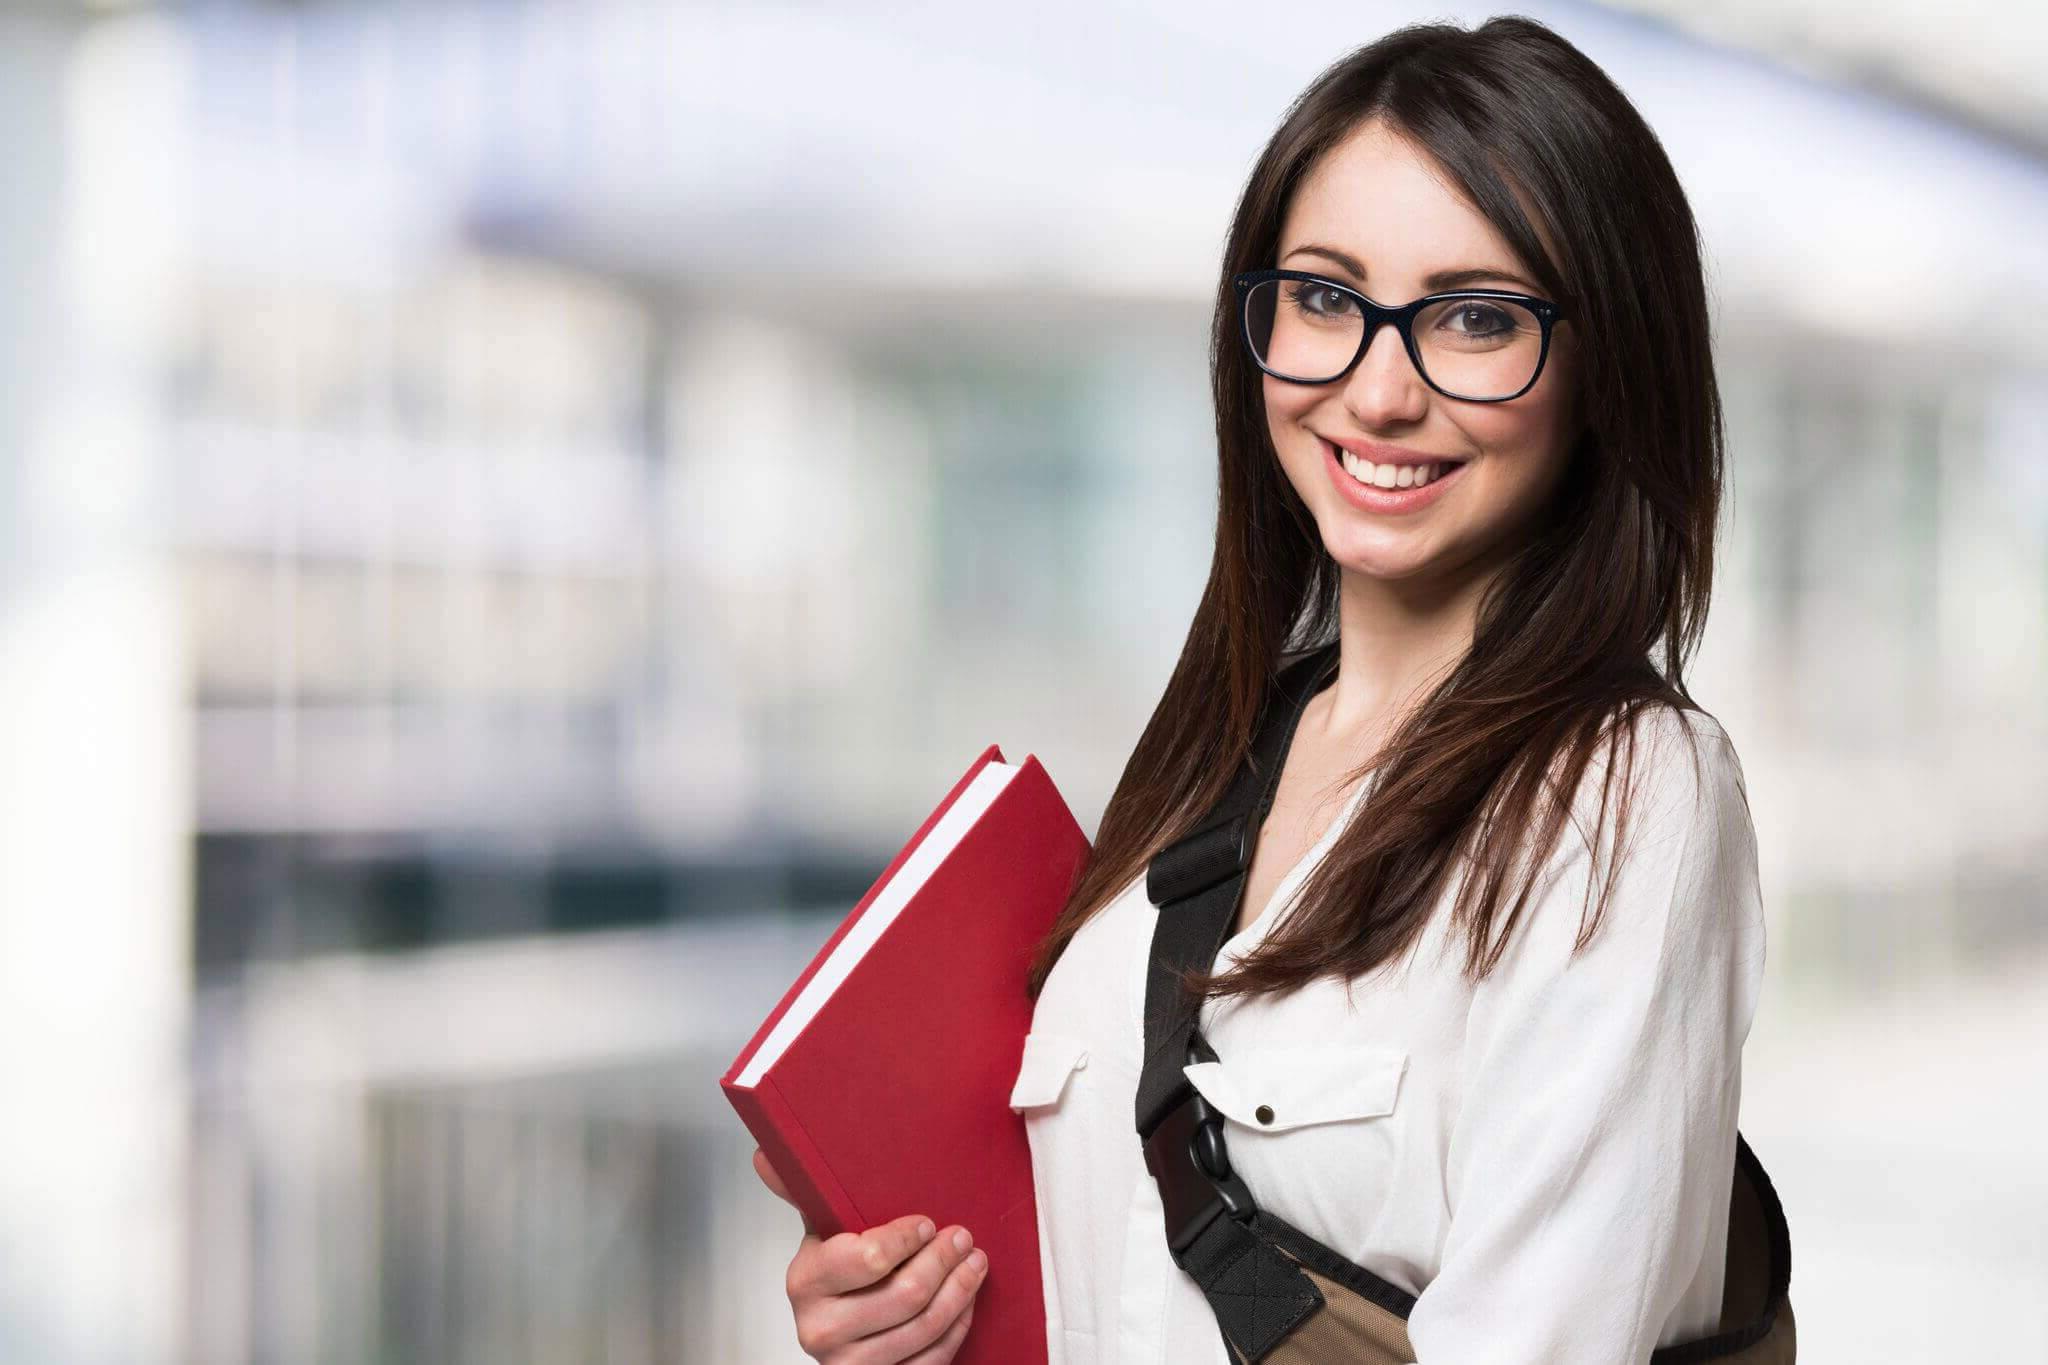 Zugang Master Of Education Universitat Bielefeld 6